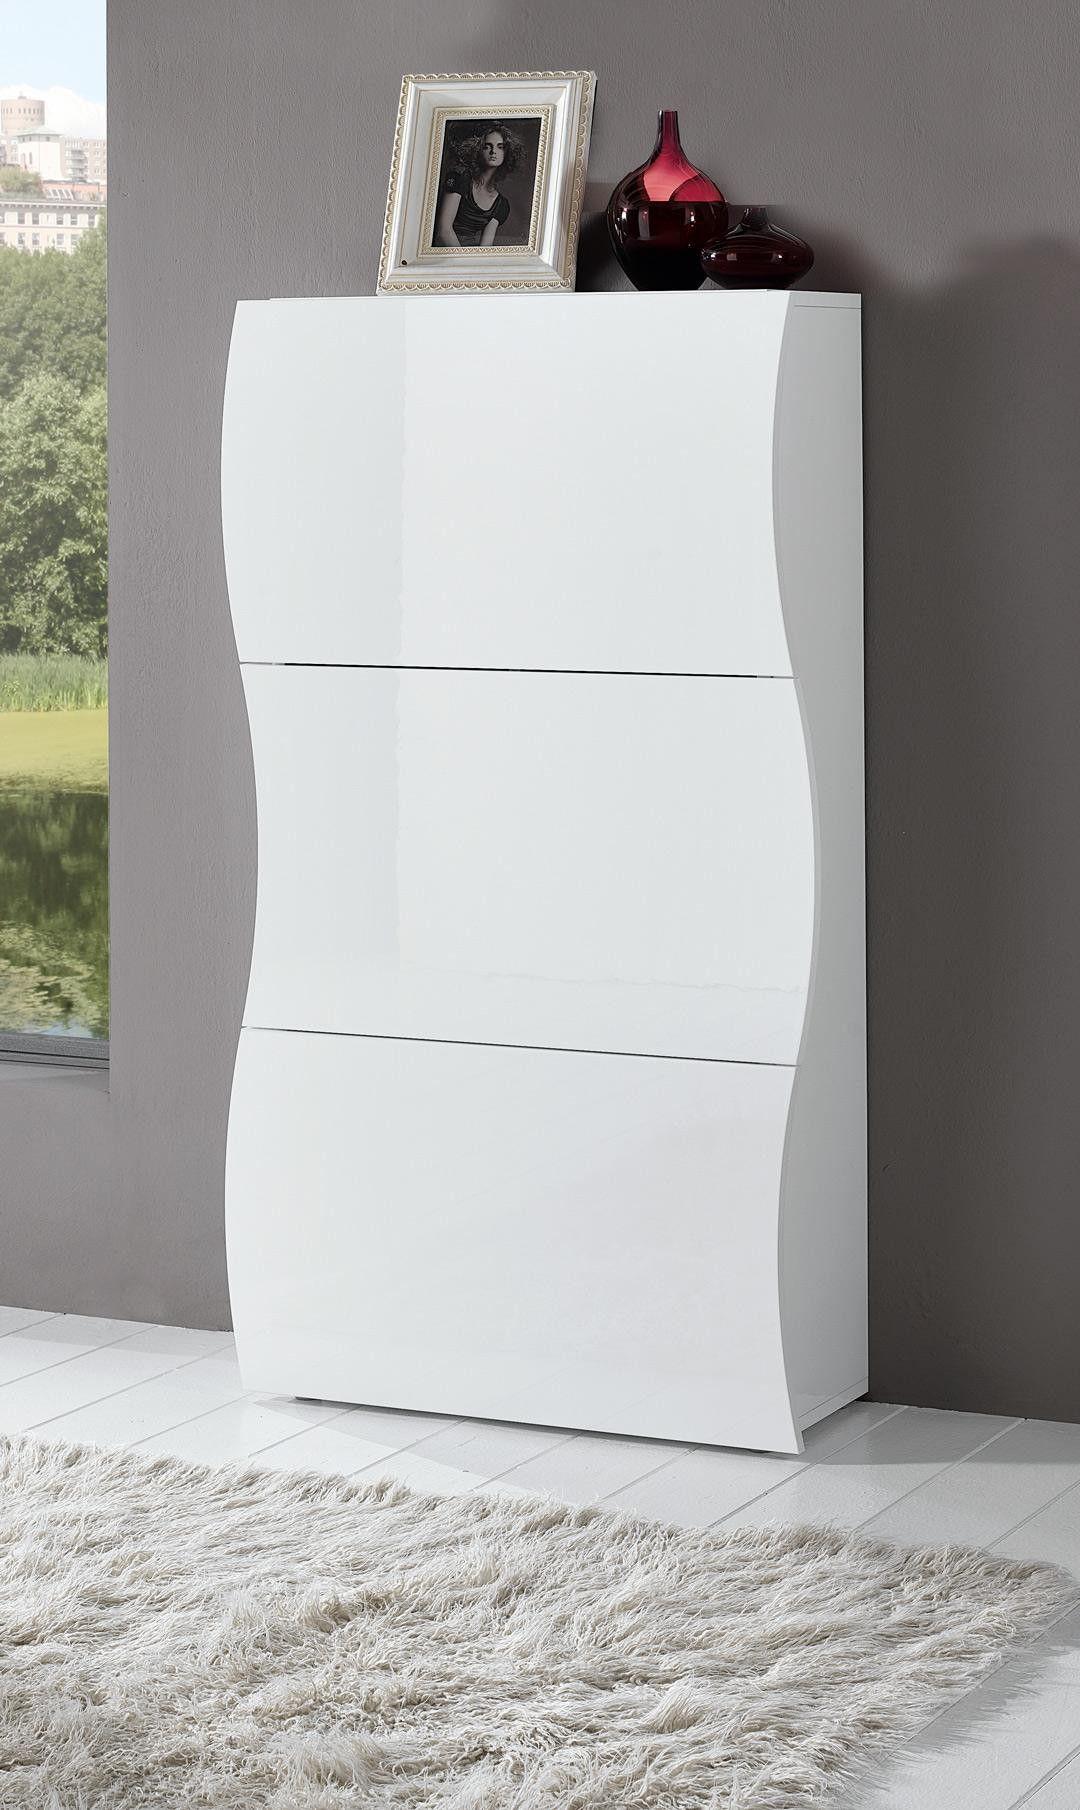 Meuble Chaussures Design 3 Portes Laqu Blanc Onida Design Pas  # Modeles De Buffet Bas Blanc Laque Design